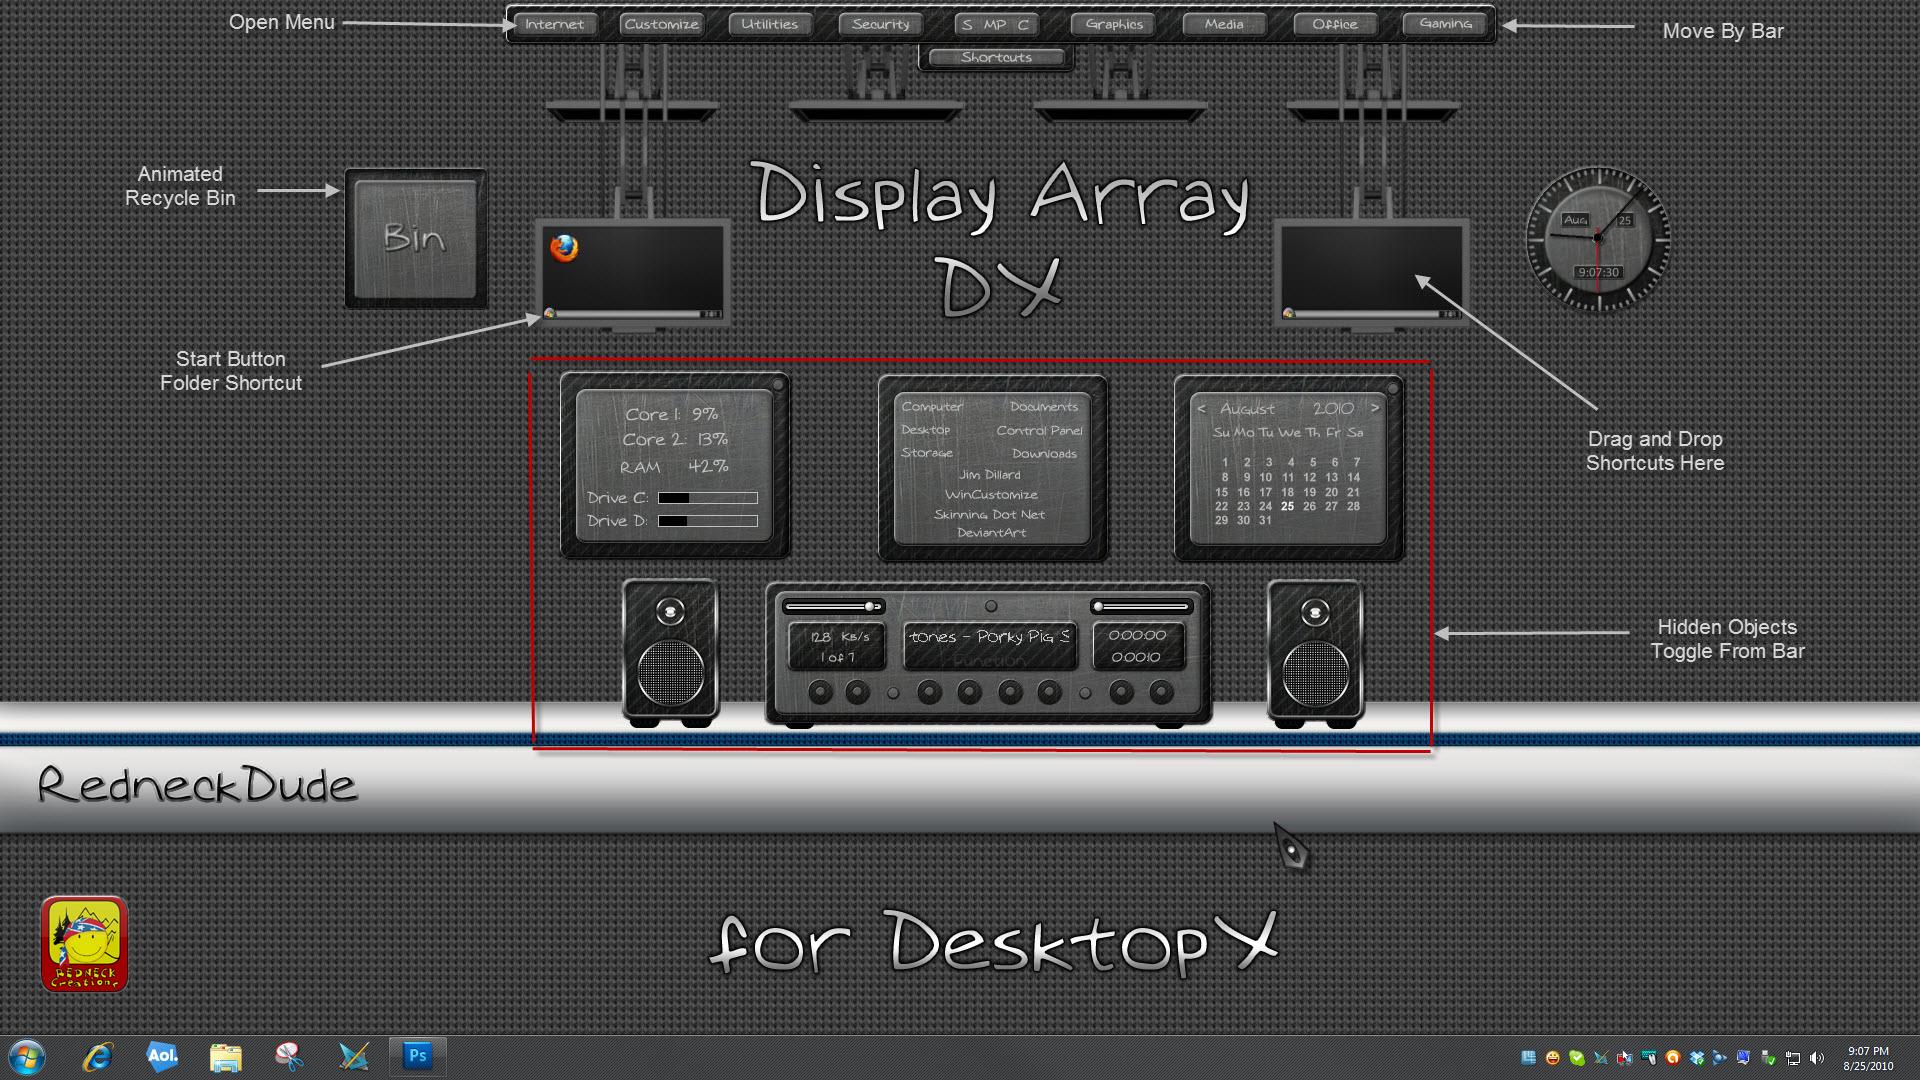 Display ArrayDX